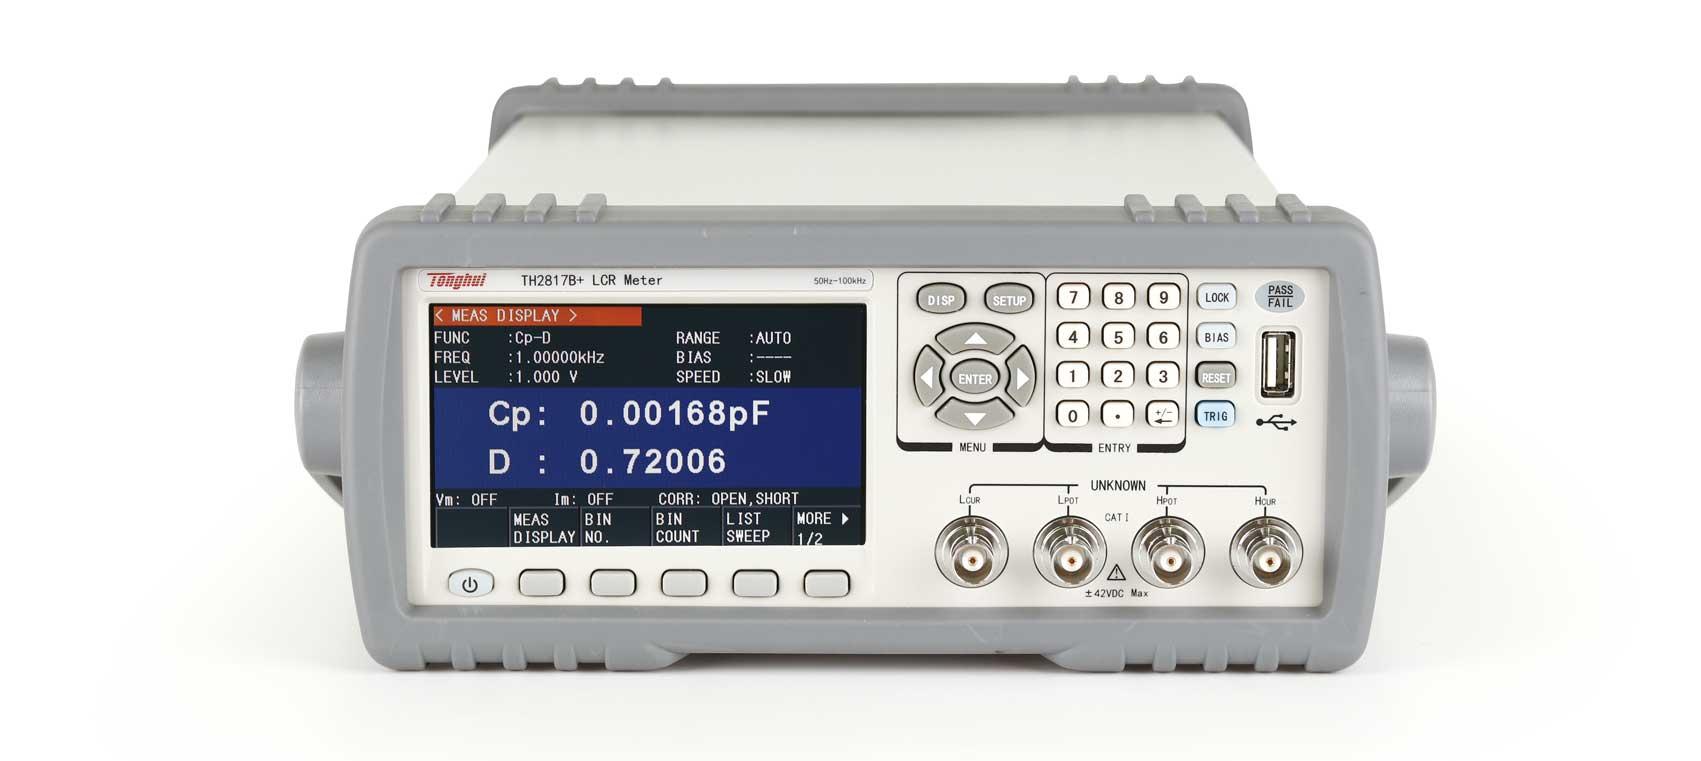 TONGHUI TH2817B-مقياس الدقة الأوتوماتيكي ، مقياس LCR ، الدقة الأساسية ، 100 كيلو هرتز ، منتج جديد ، 0.1%